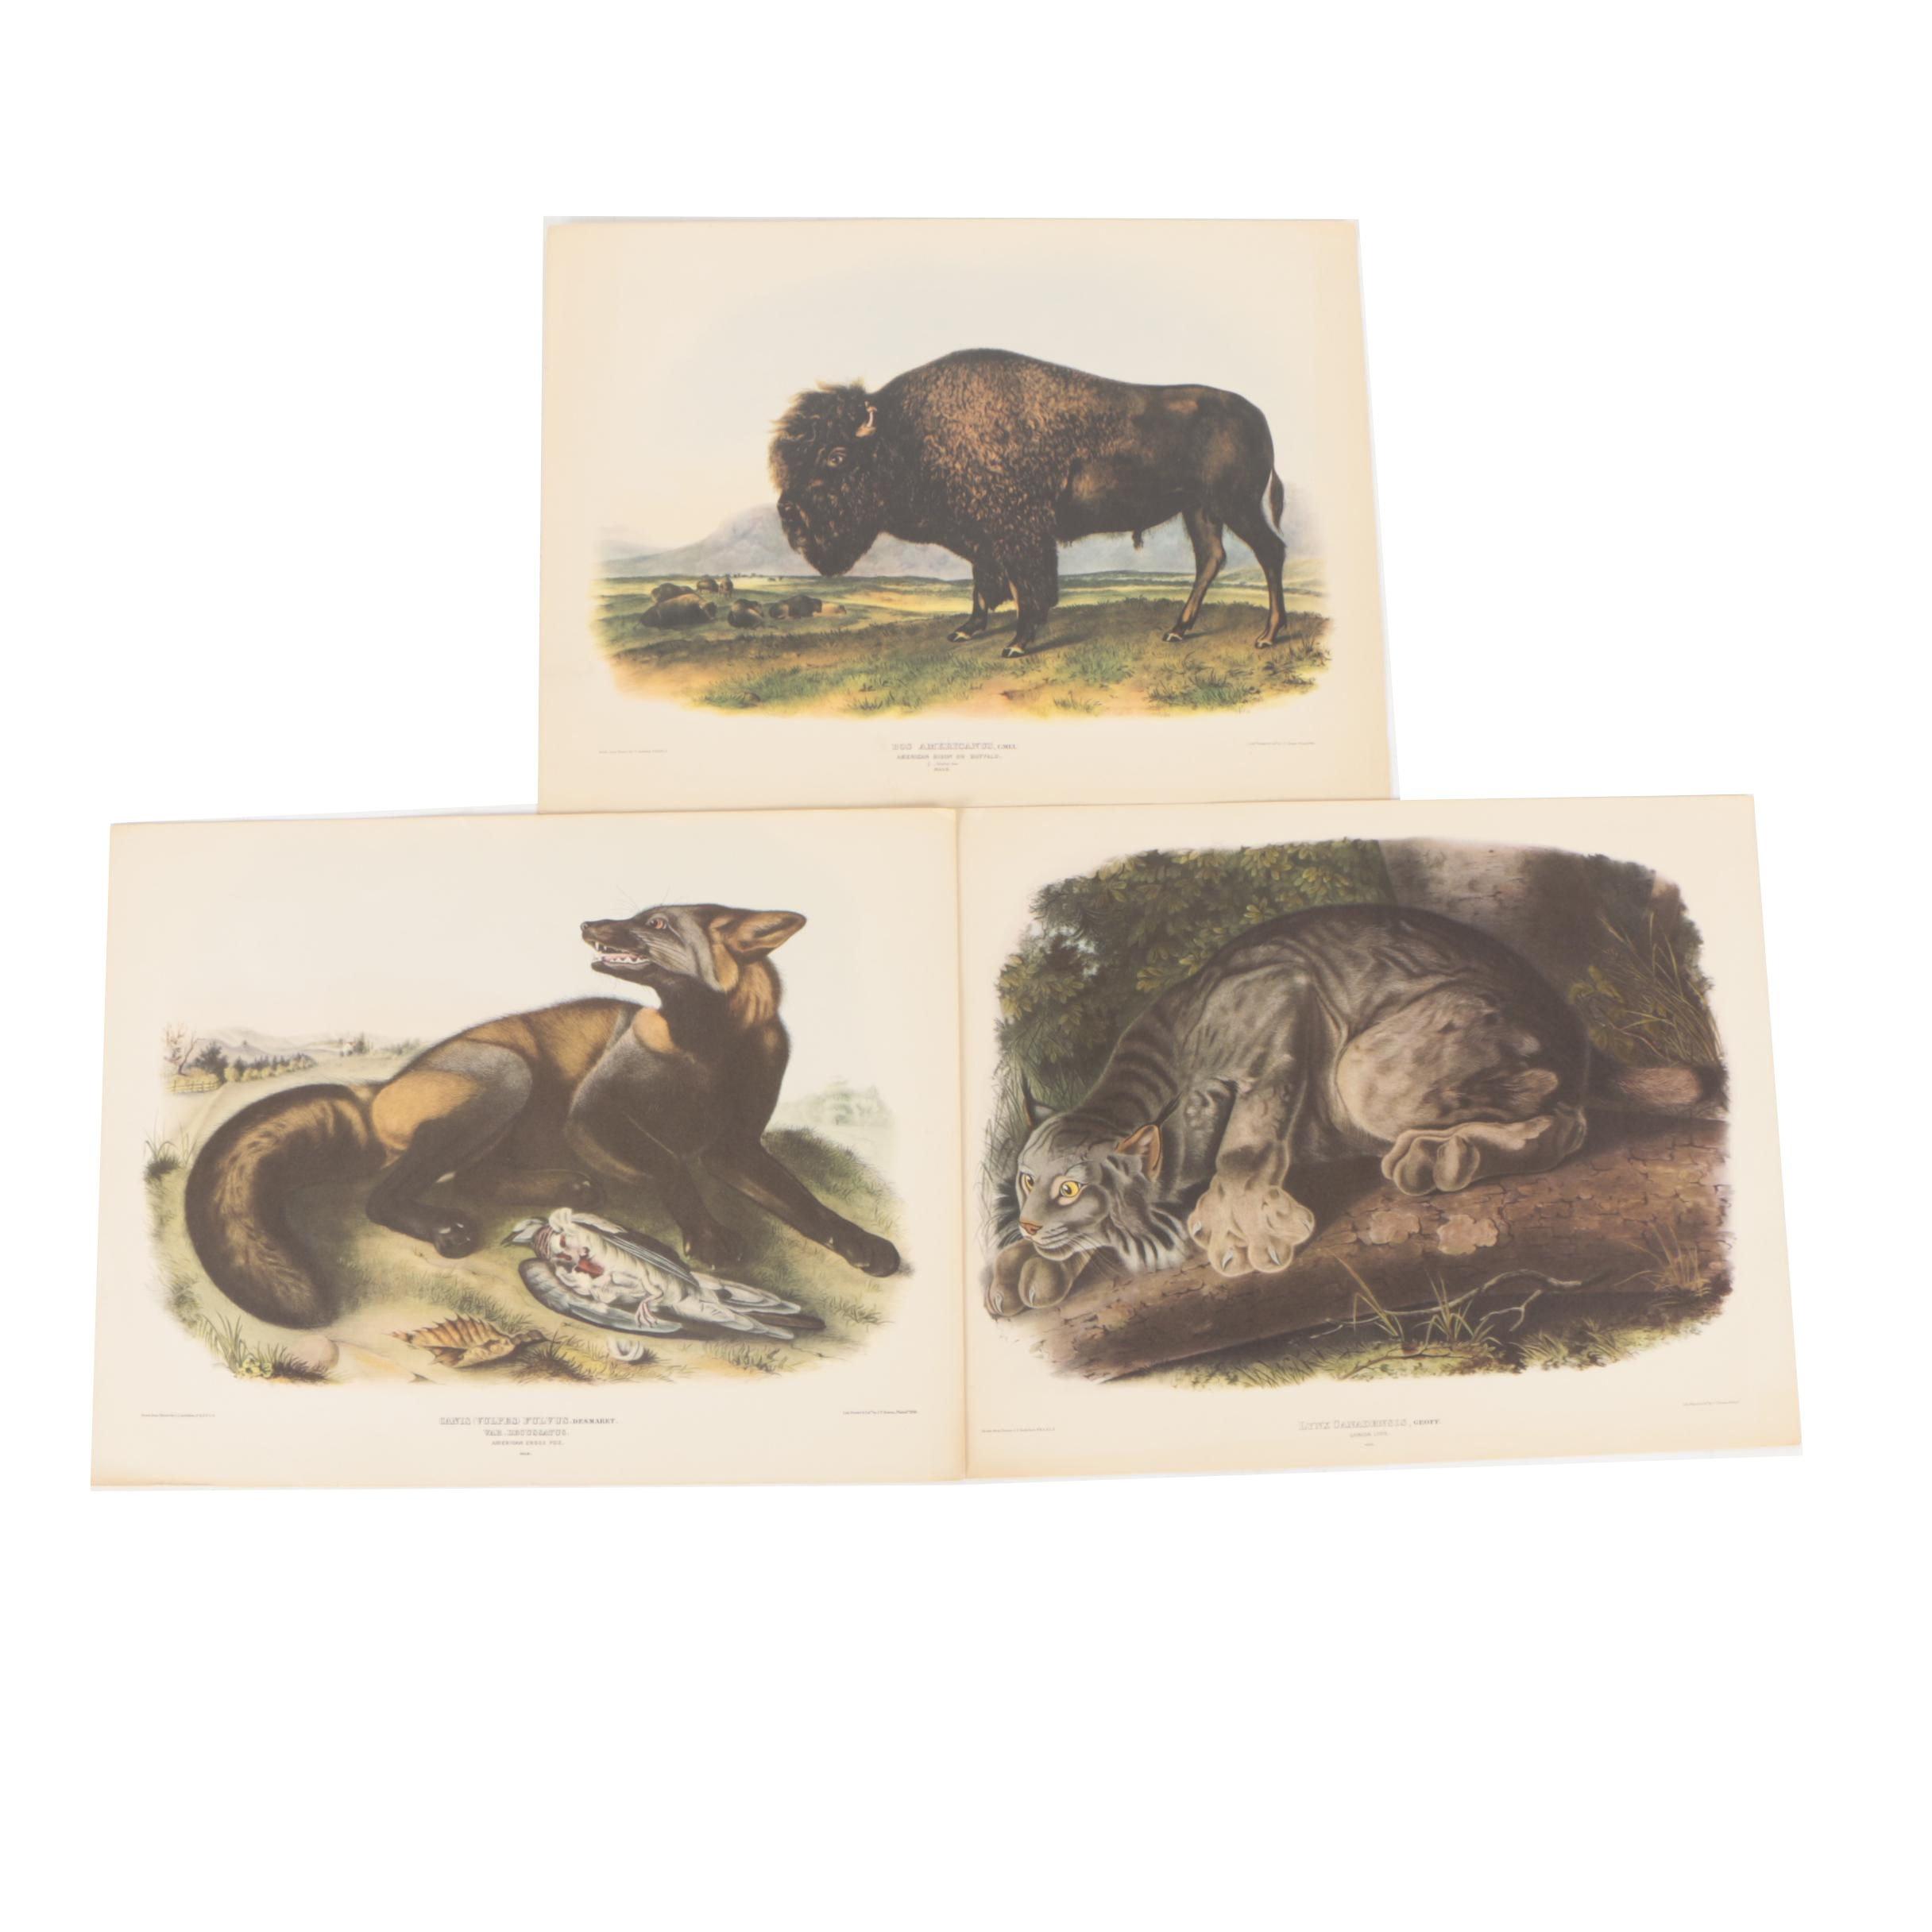 Three Vintage Offset Lithographs After John James Audubon